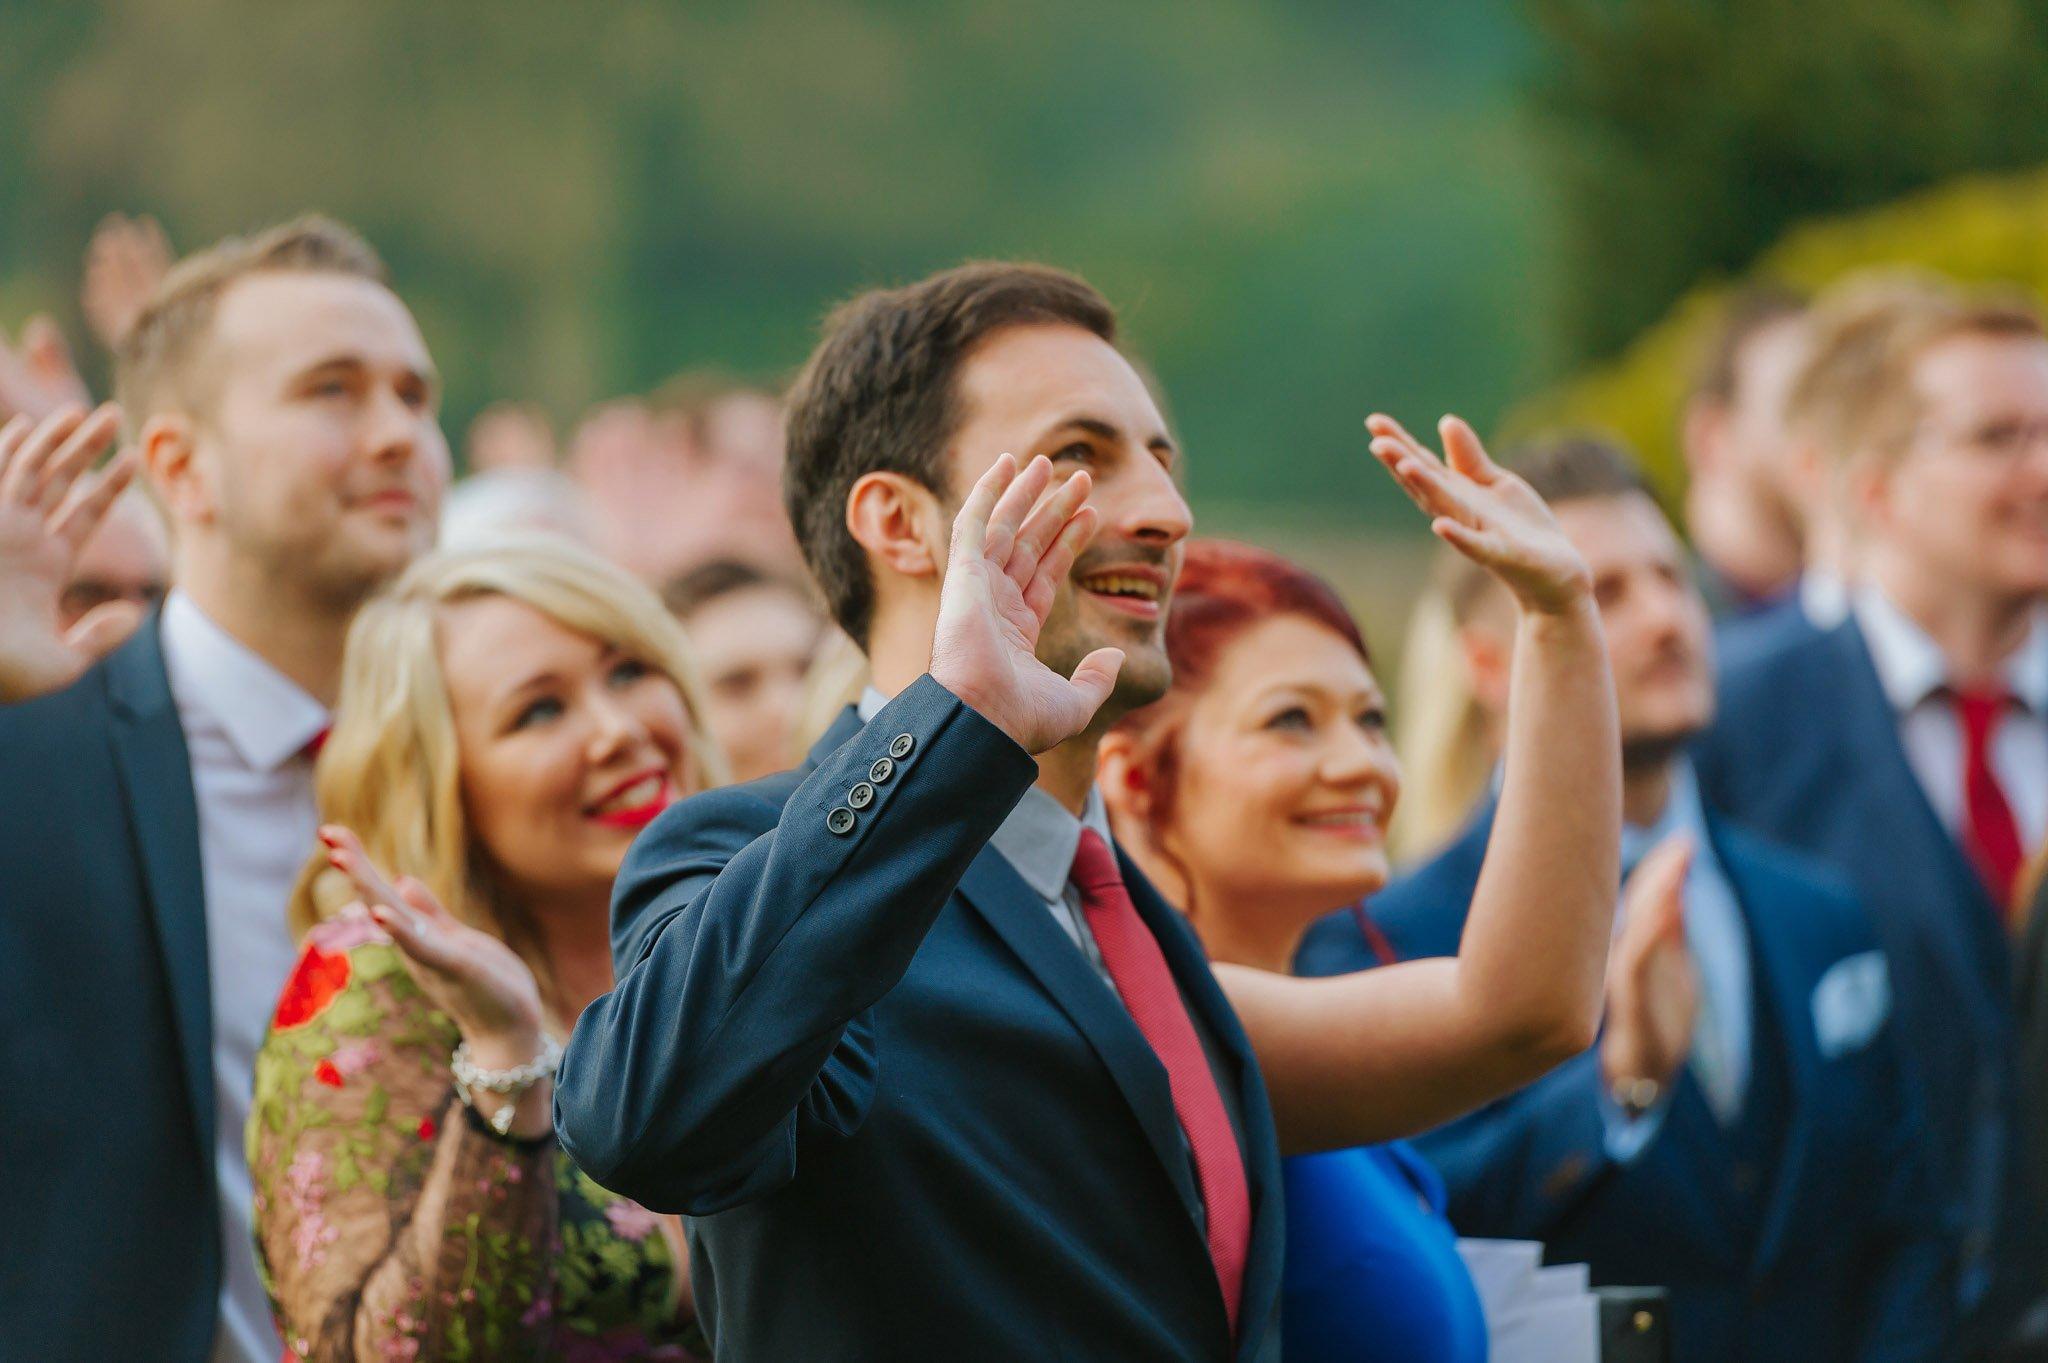 Coombe Abbey wedding in Coventry, Warwickshire - Sam + Matt 32